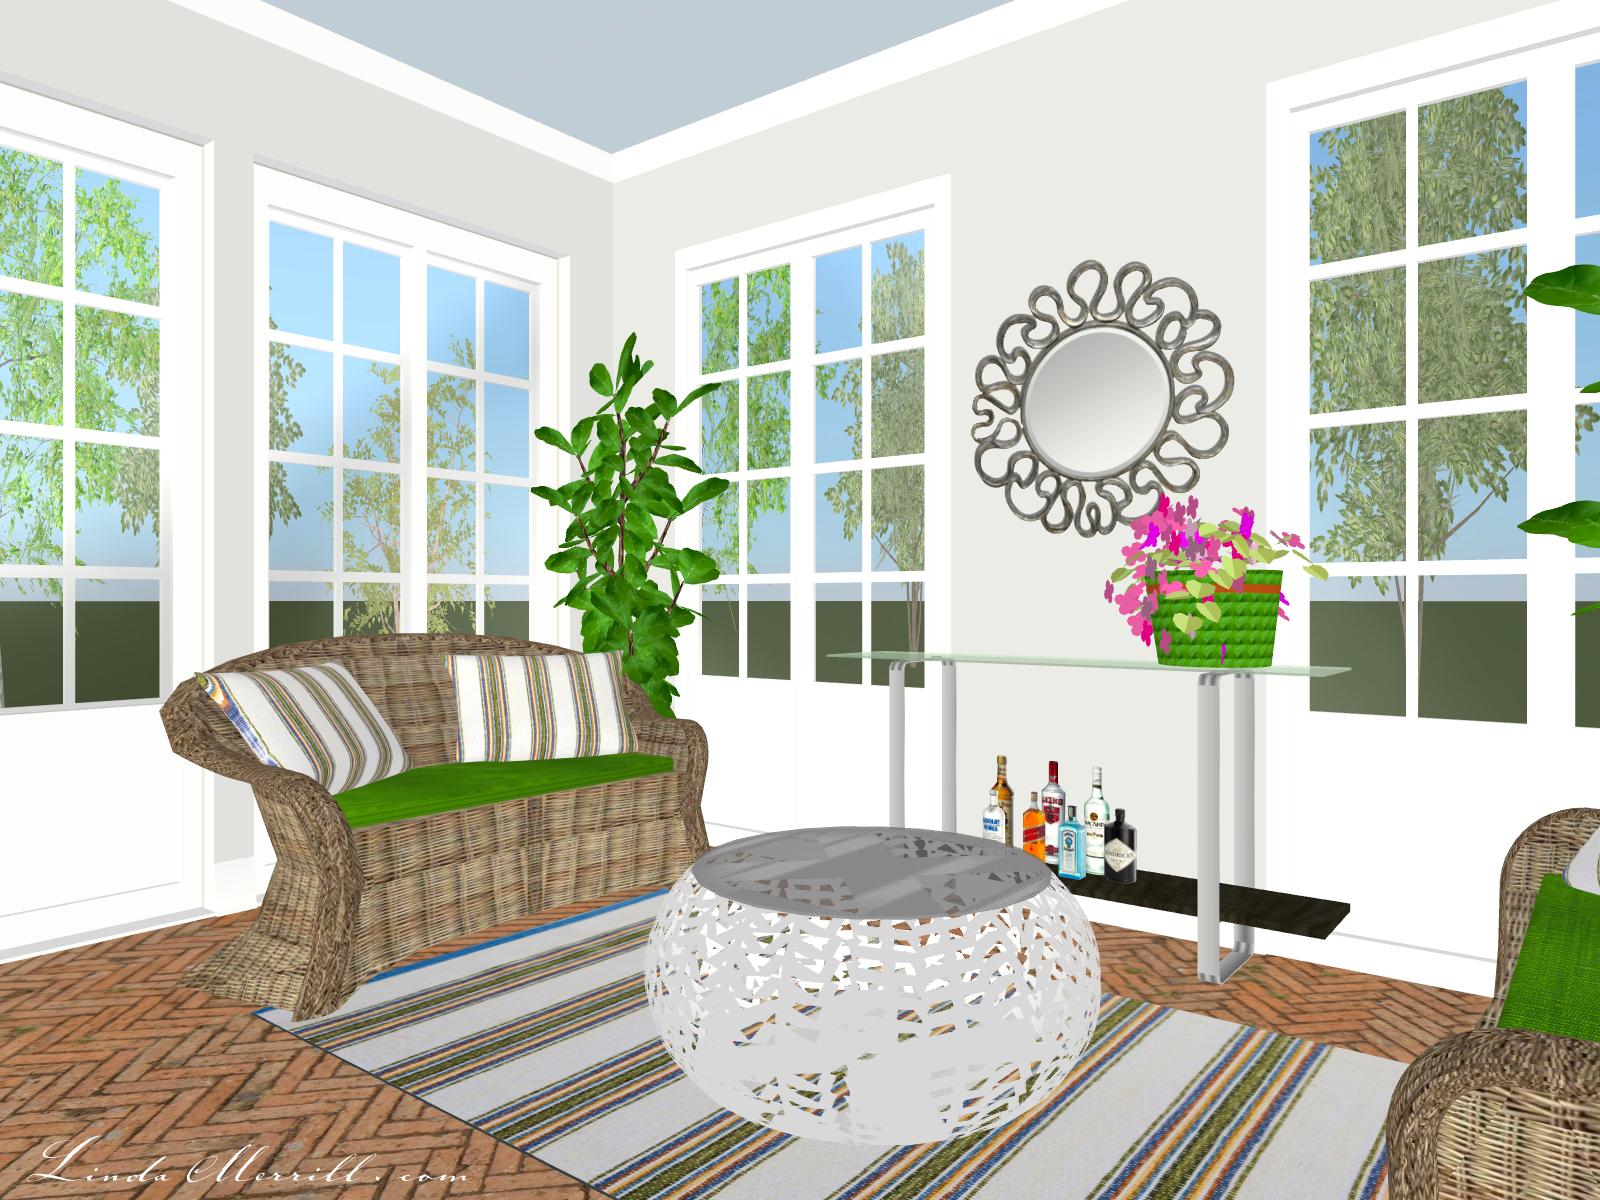 Linda Merrill Coastal Collection Newport Rug Gray blue green Sunroom 2